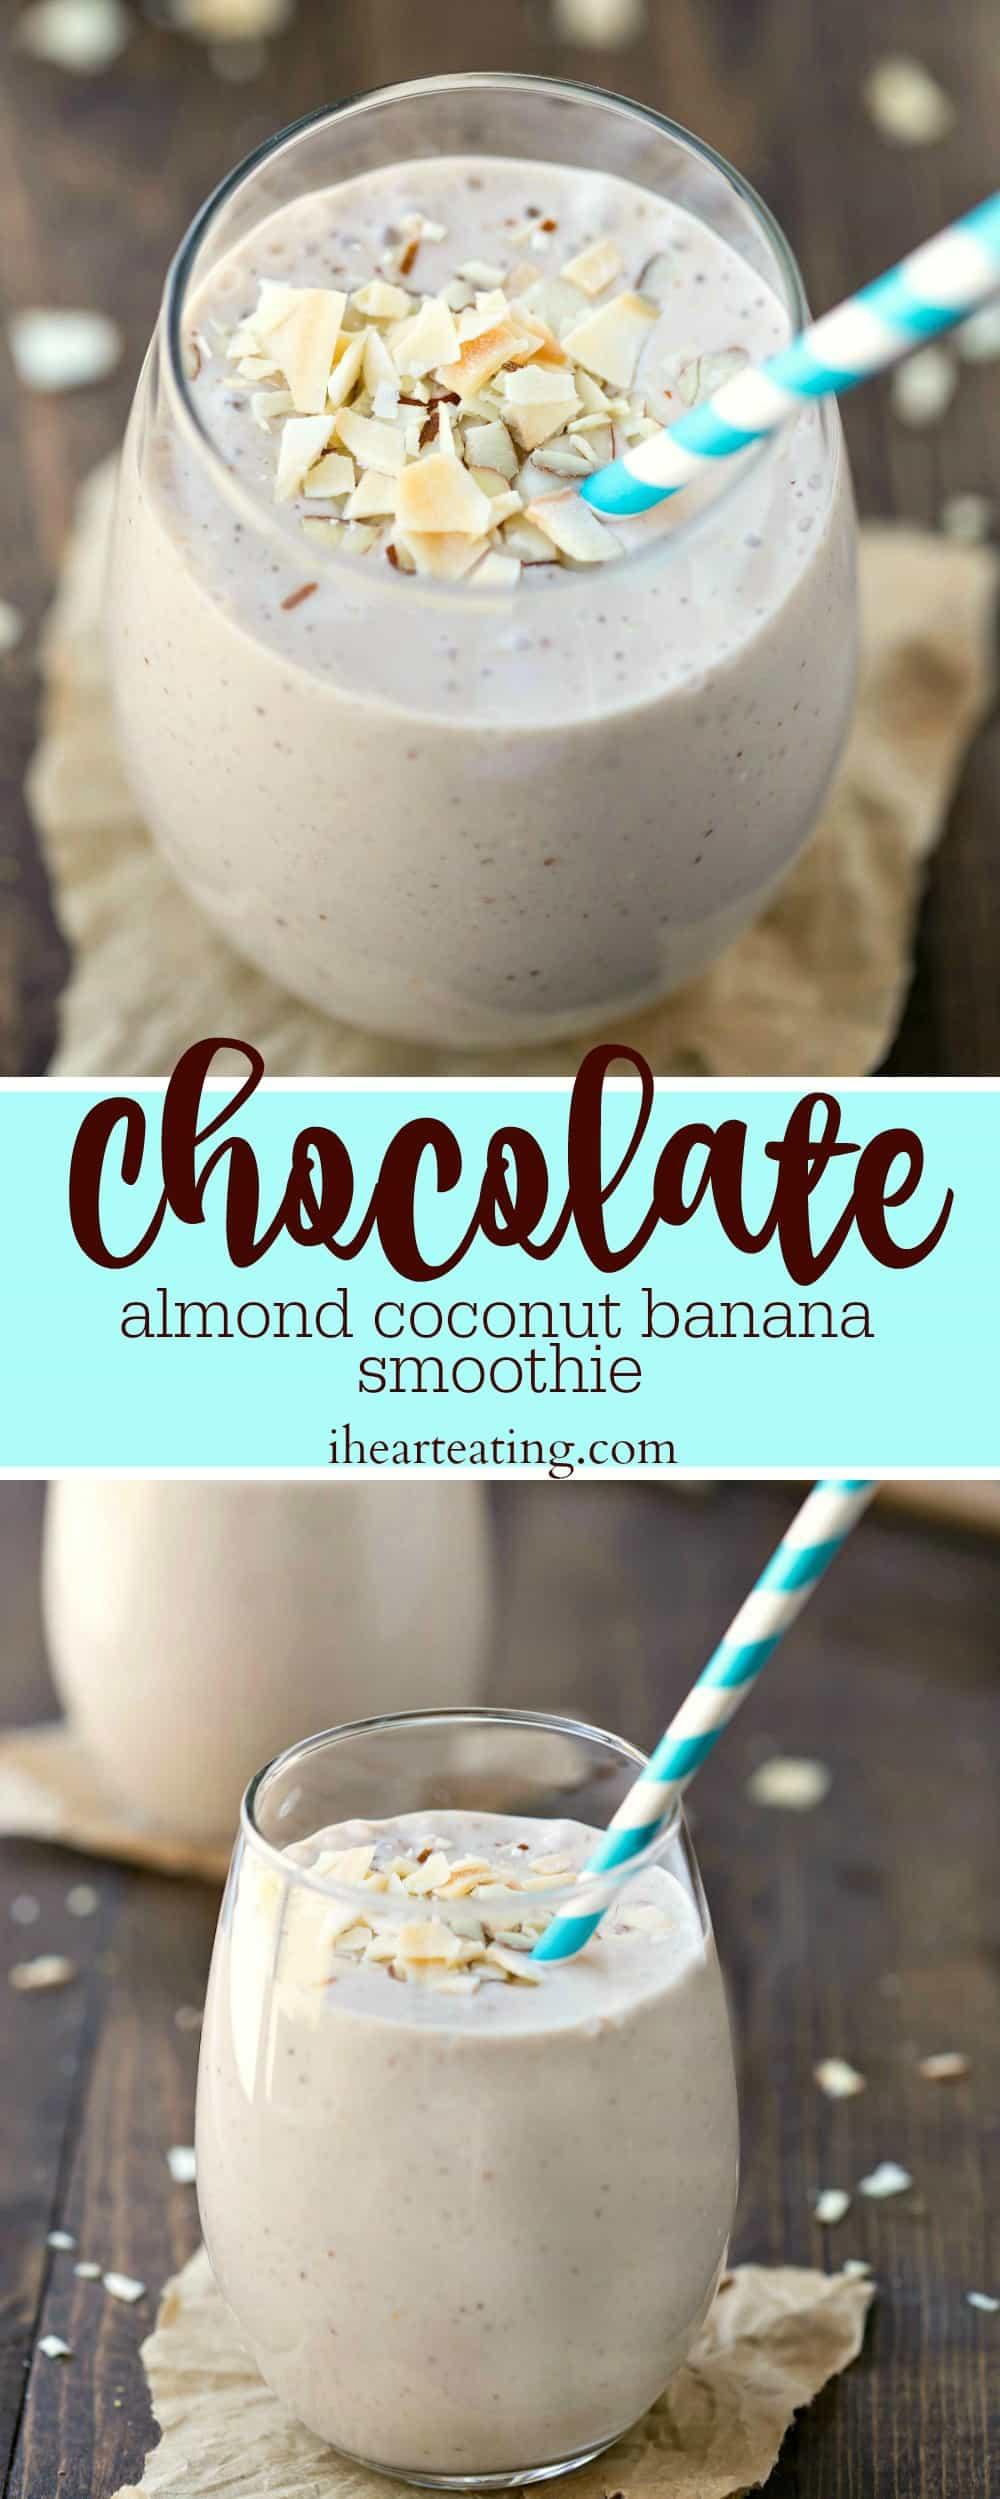 Chocolate Almond Coconut Banana Smoothie Recipe